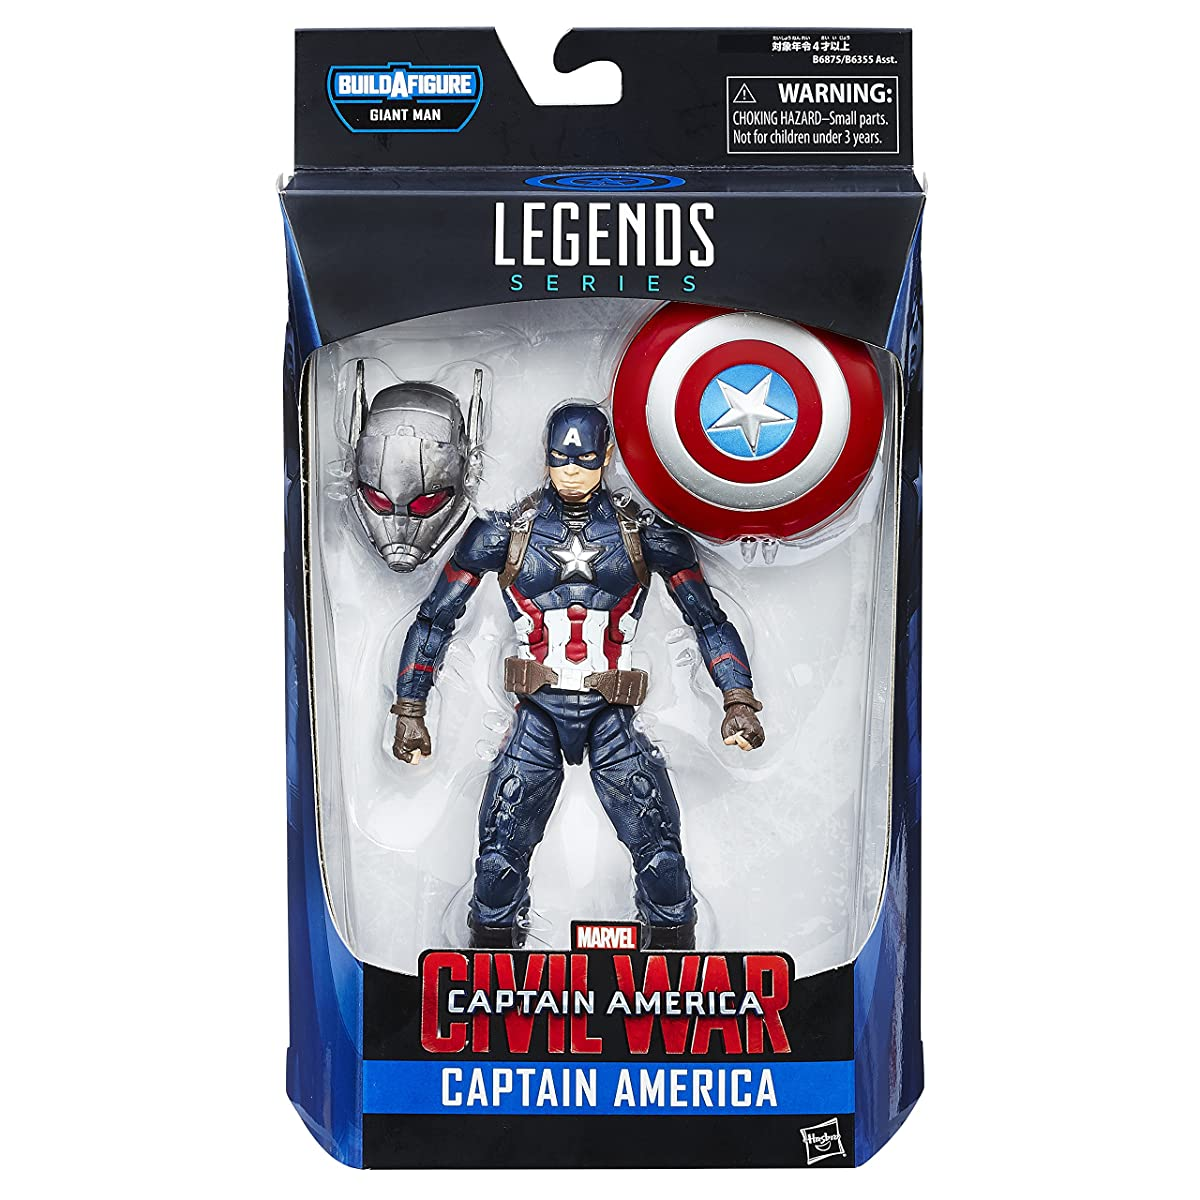 Marvel 6-Inch Legends Series Captain America Figure